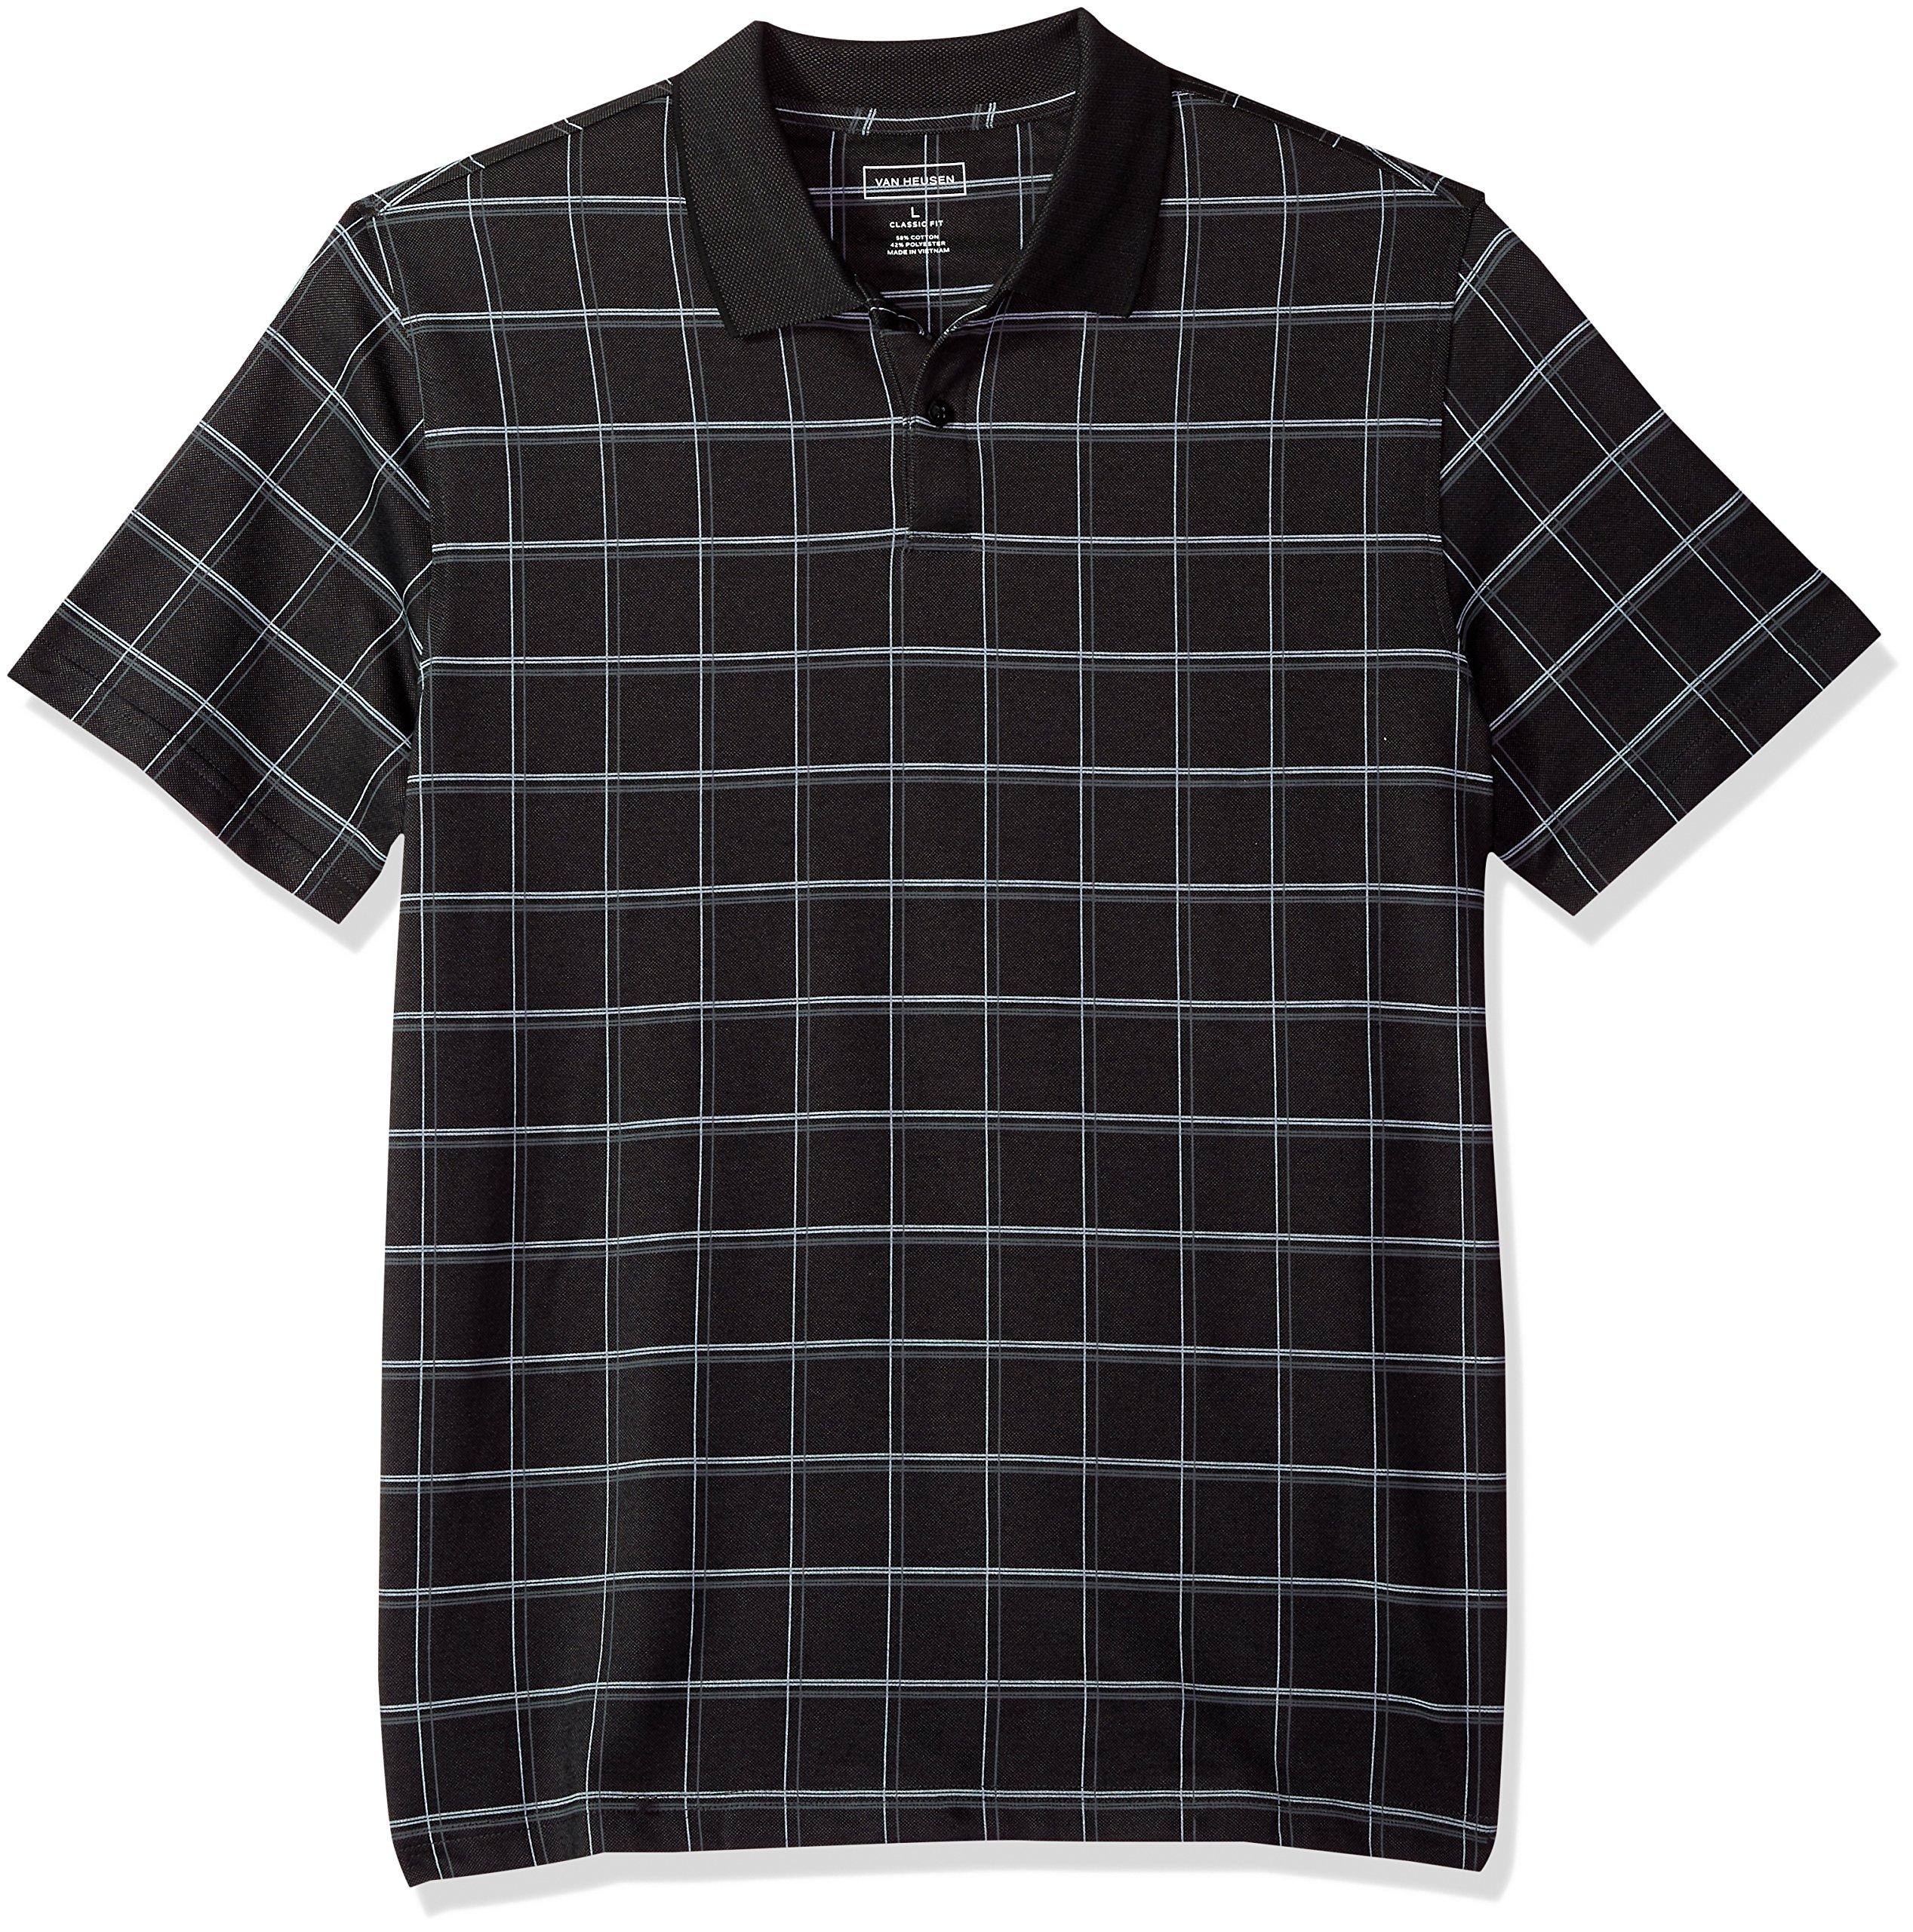 Van Heusen Men's Printed Windowpane Short Sleeve Polo, Black, XX-Large